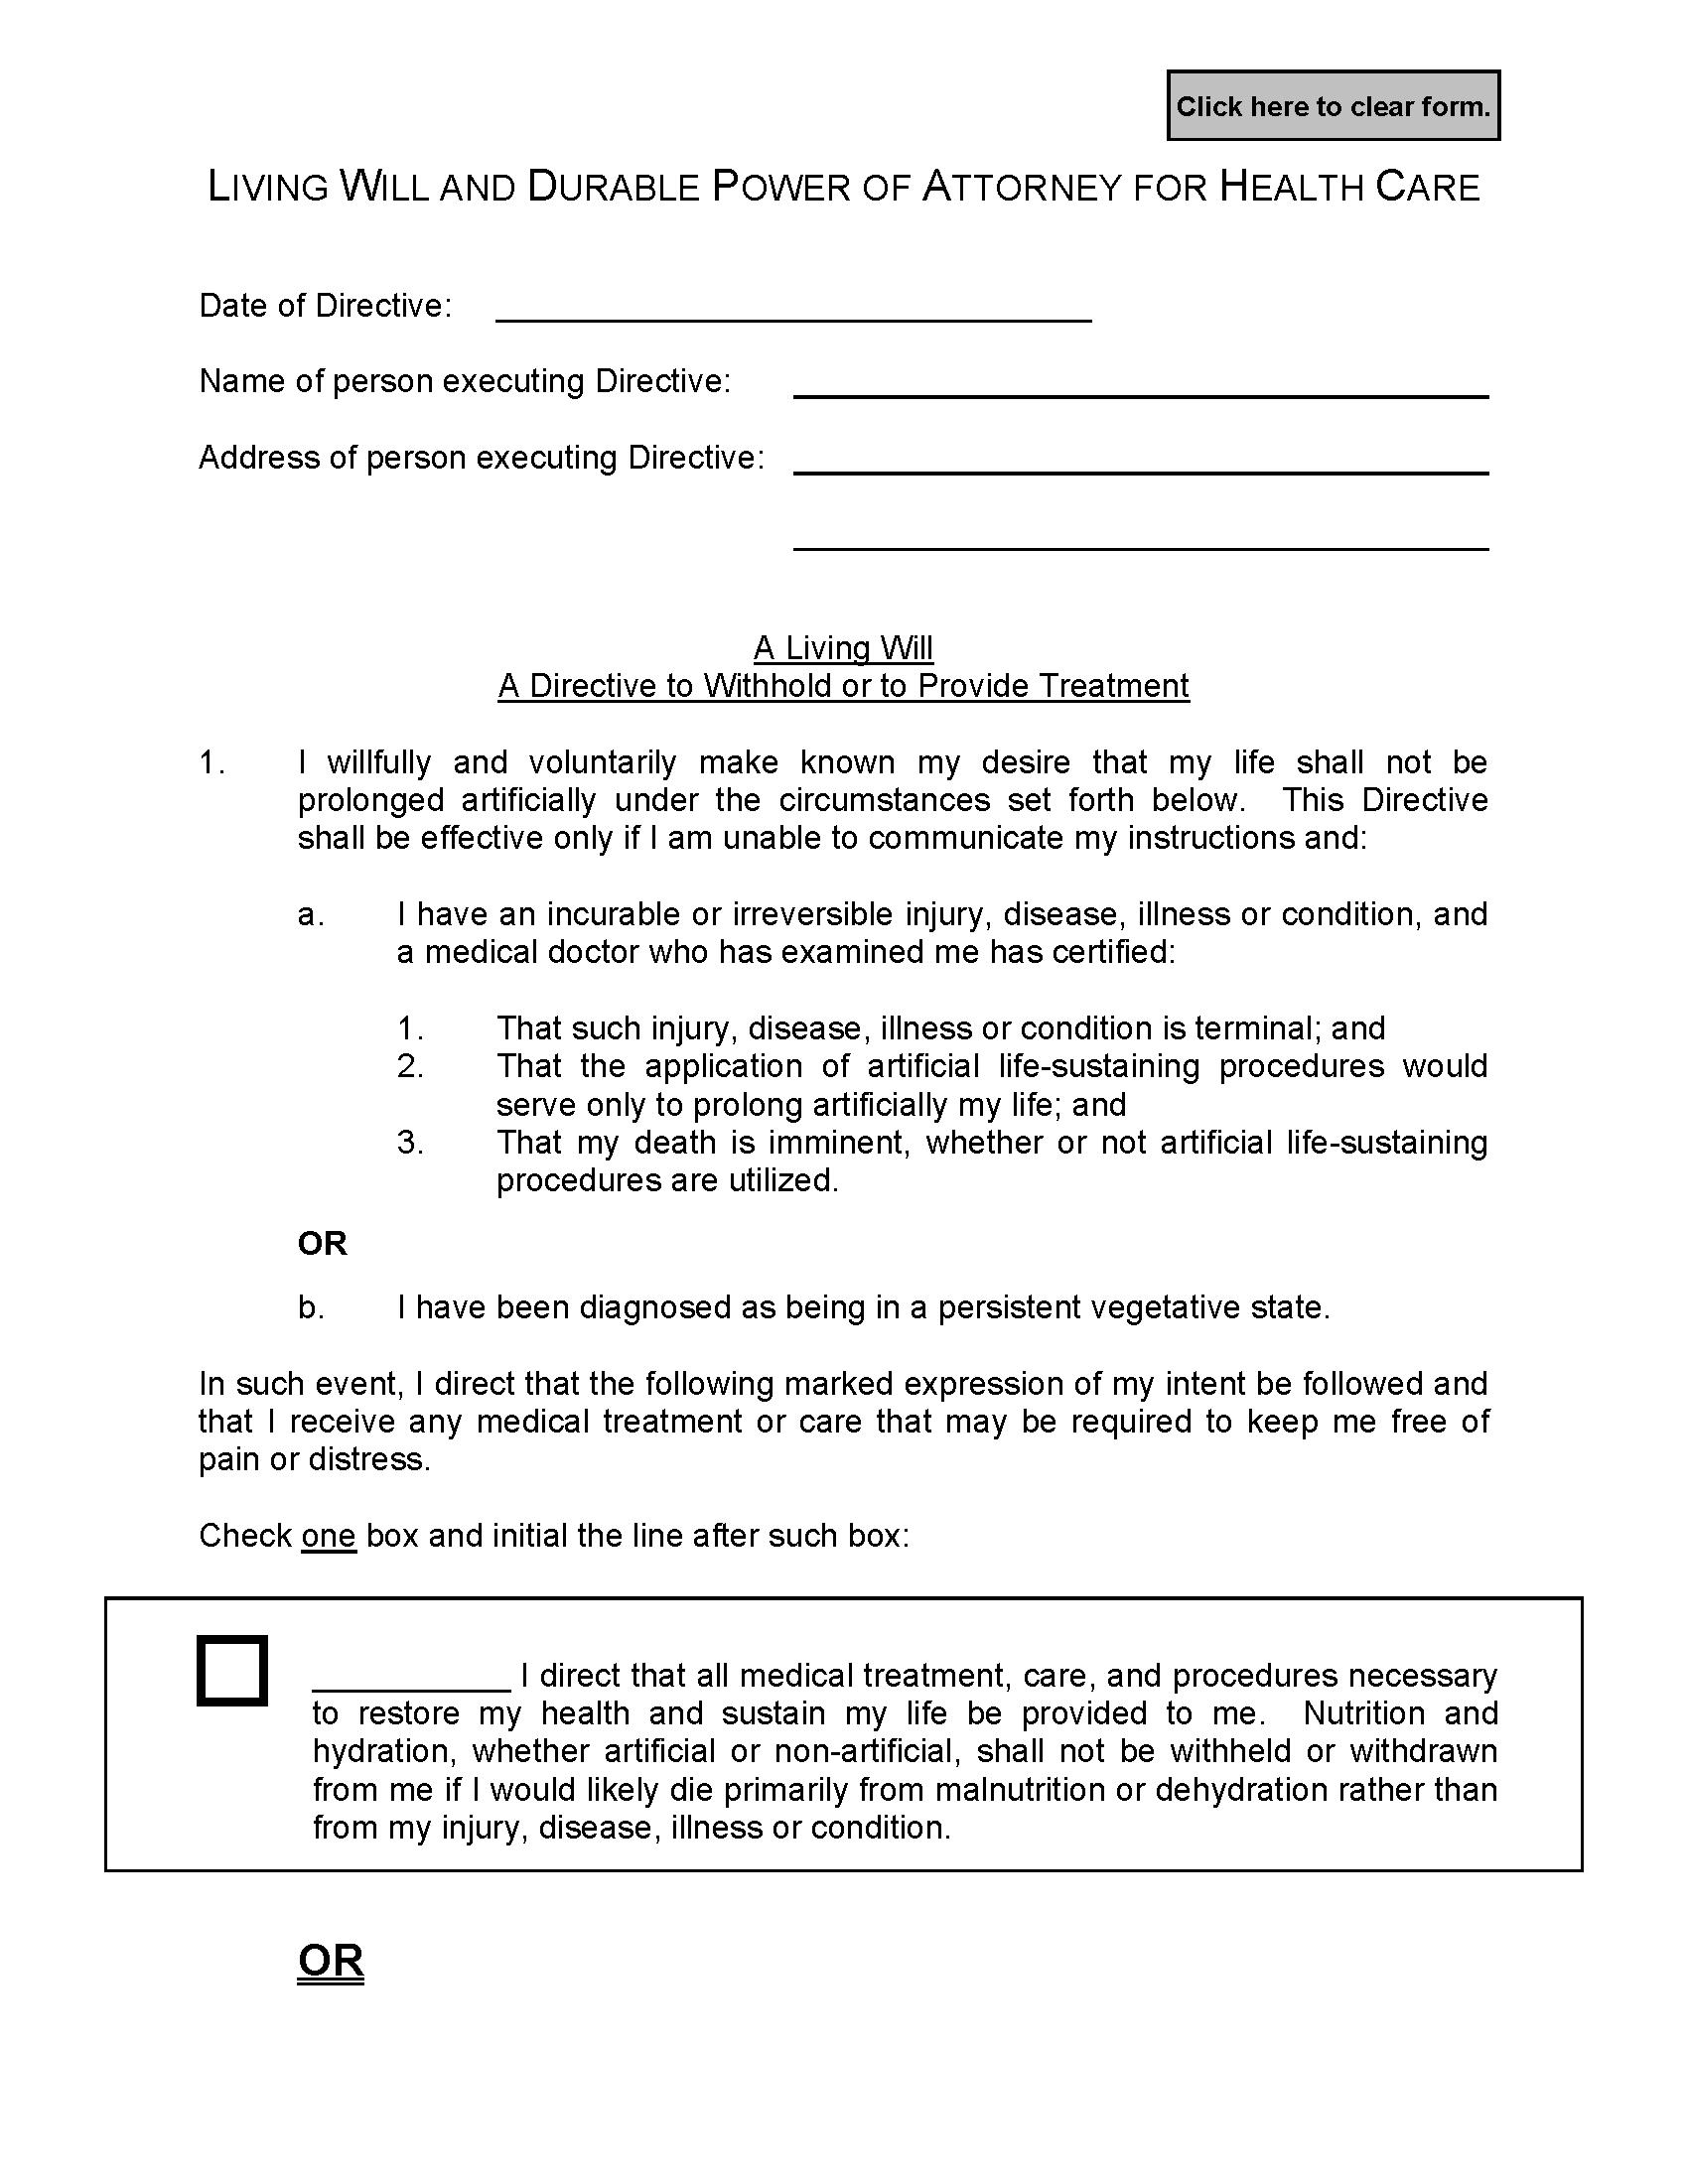 Idaho Advance Directive For Health Care